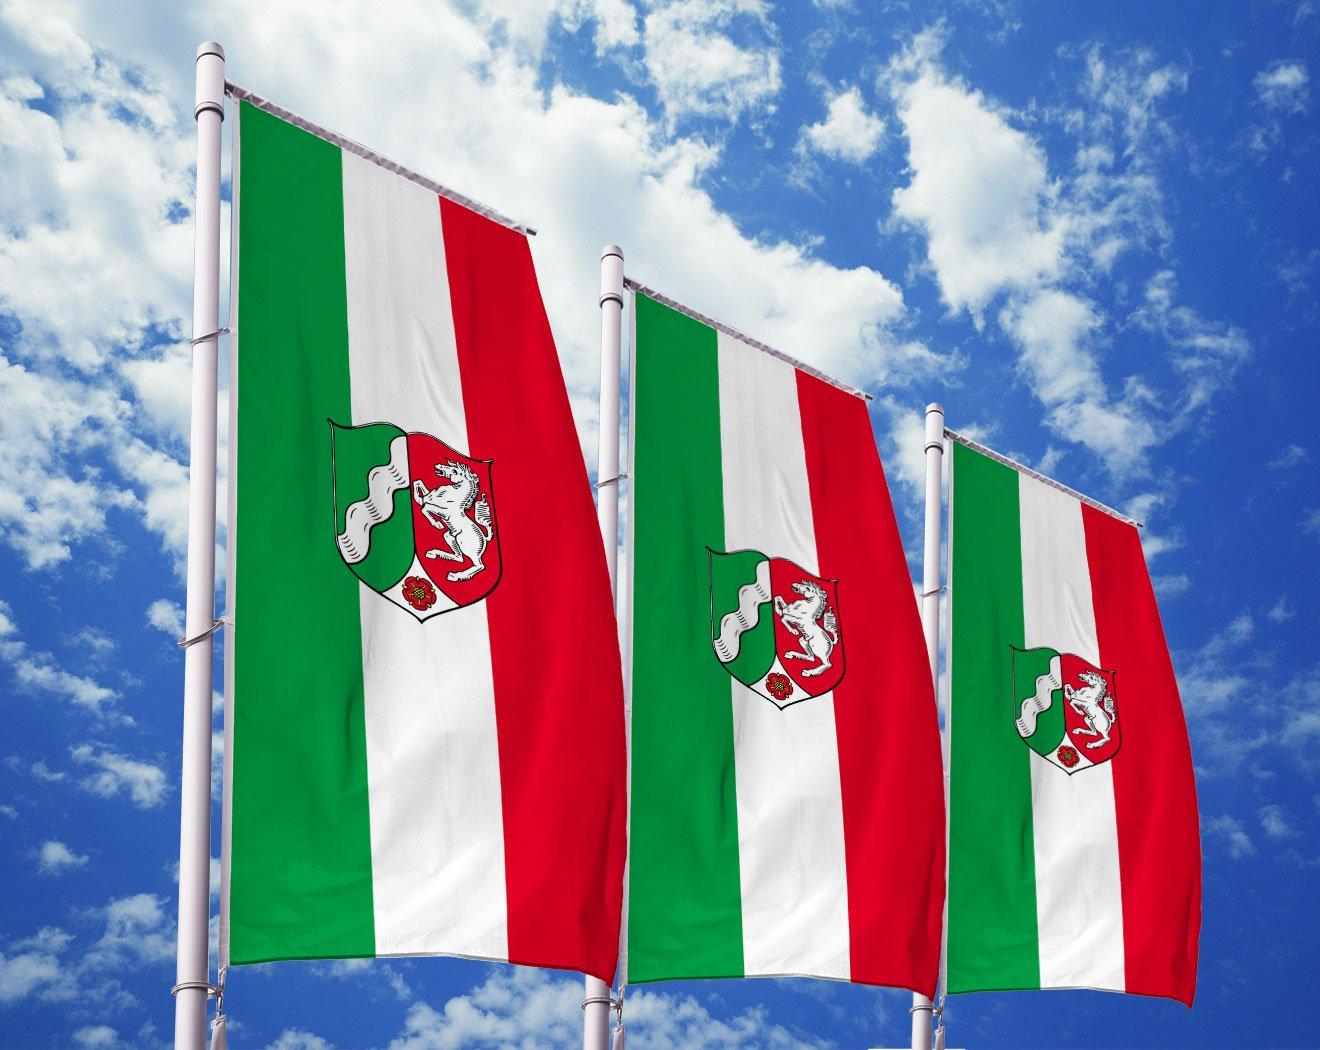 Nordrhein-Westfalen-Flagge mit Wappen bedrucken lassen